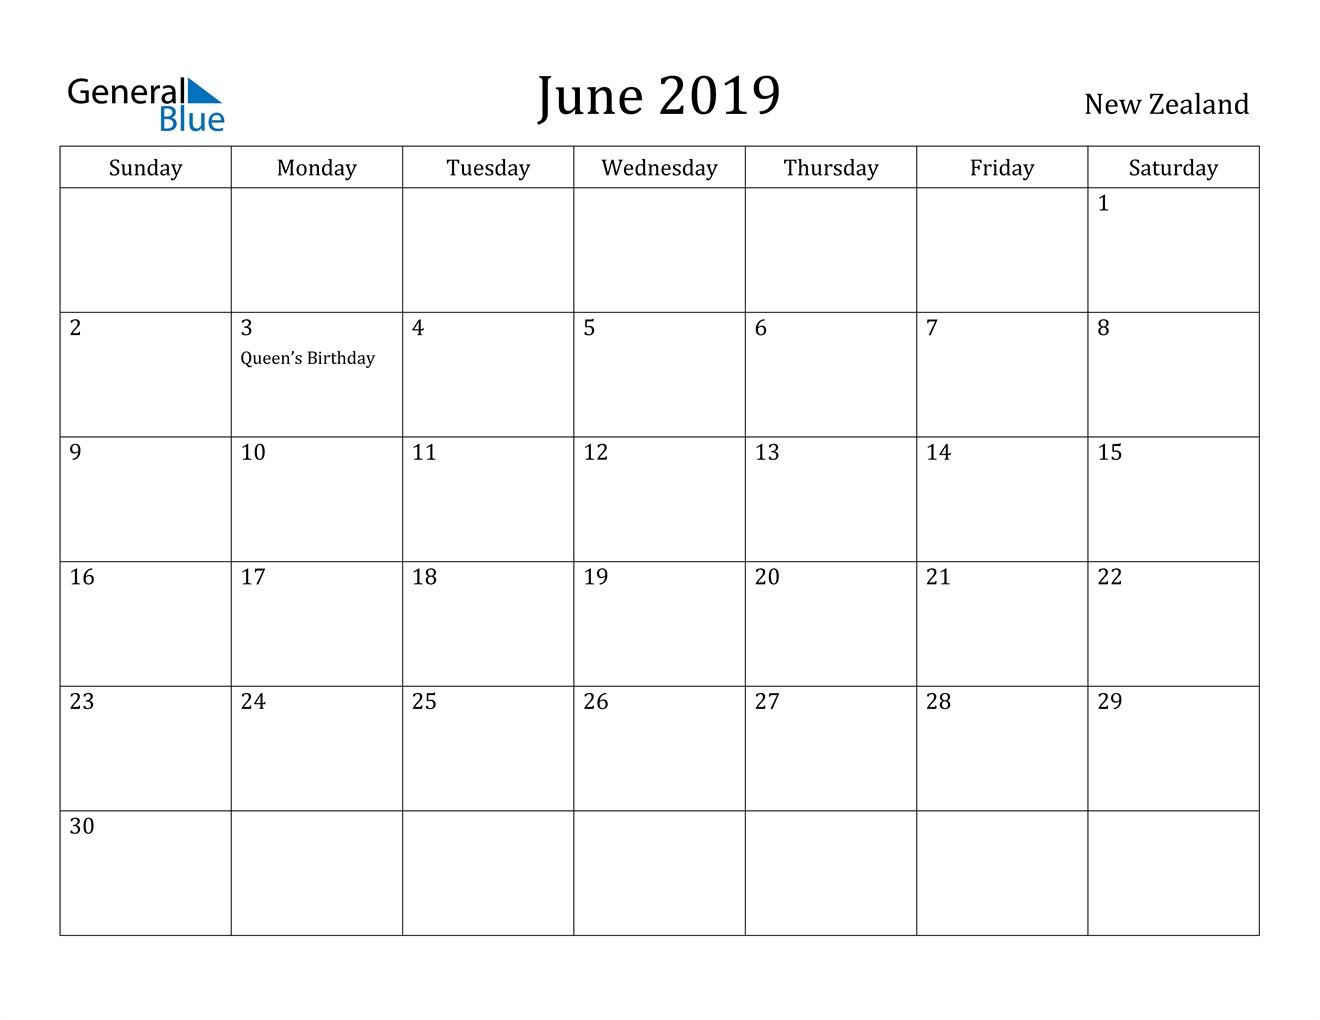 Image of June 2019 New Zealand Calendar with Holidays Calendar